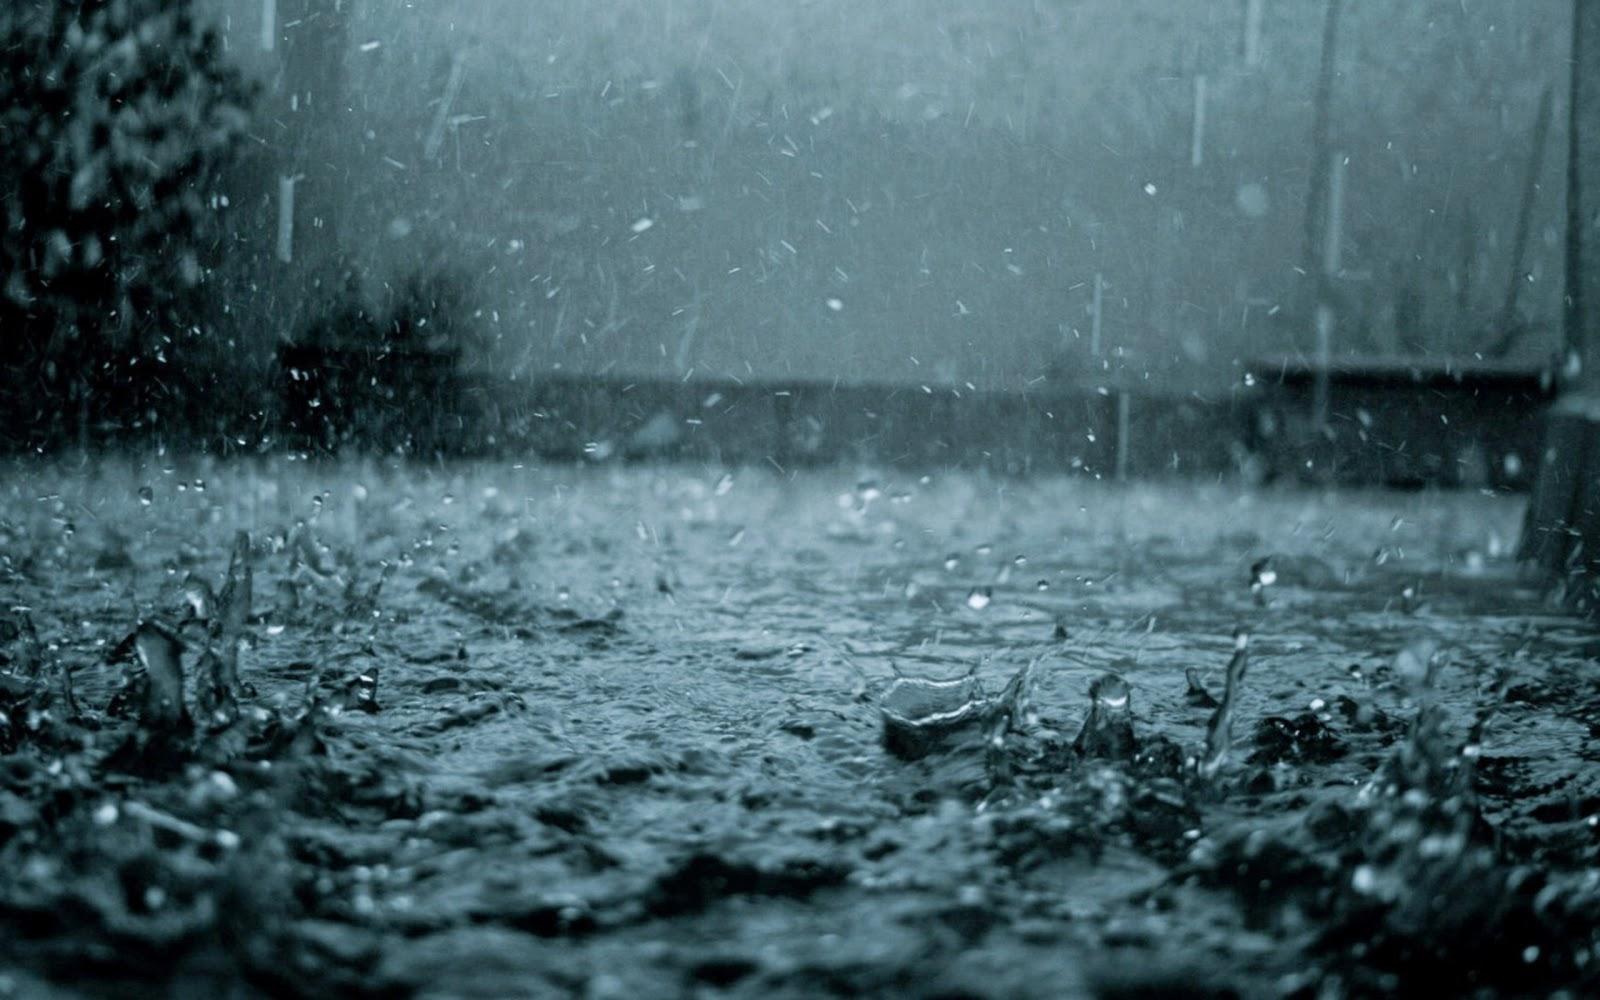 Hẻm mưa